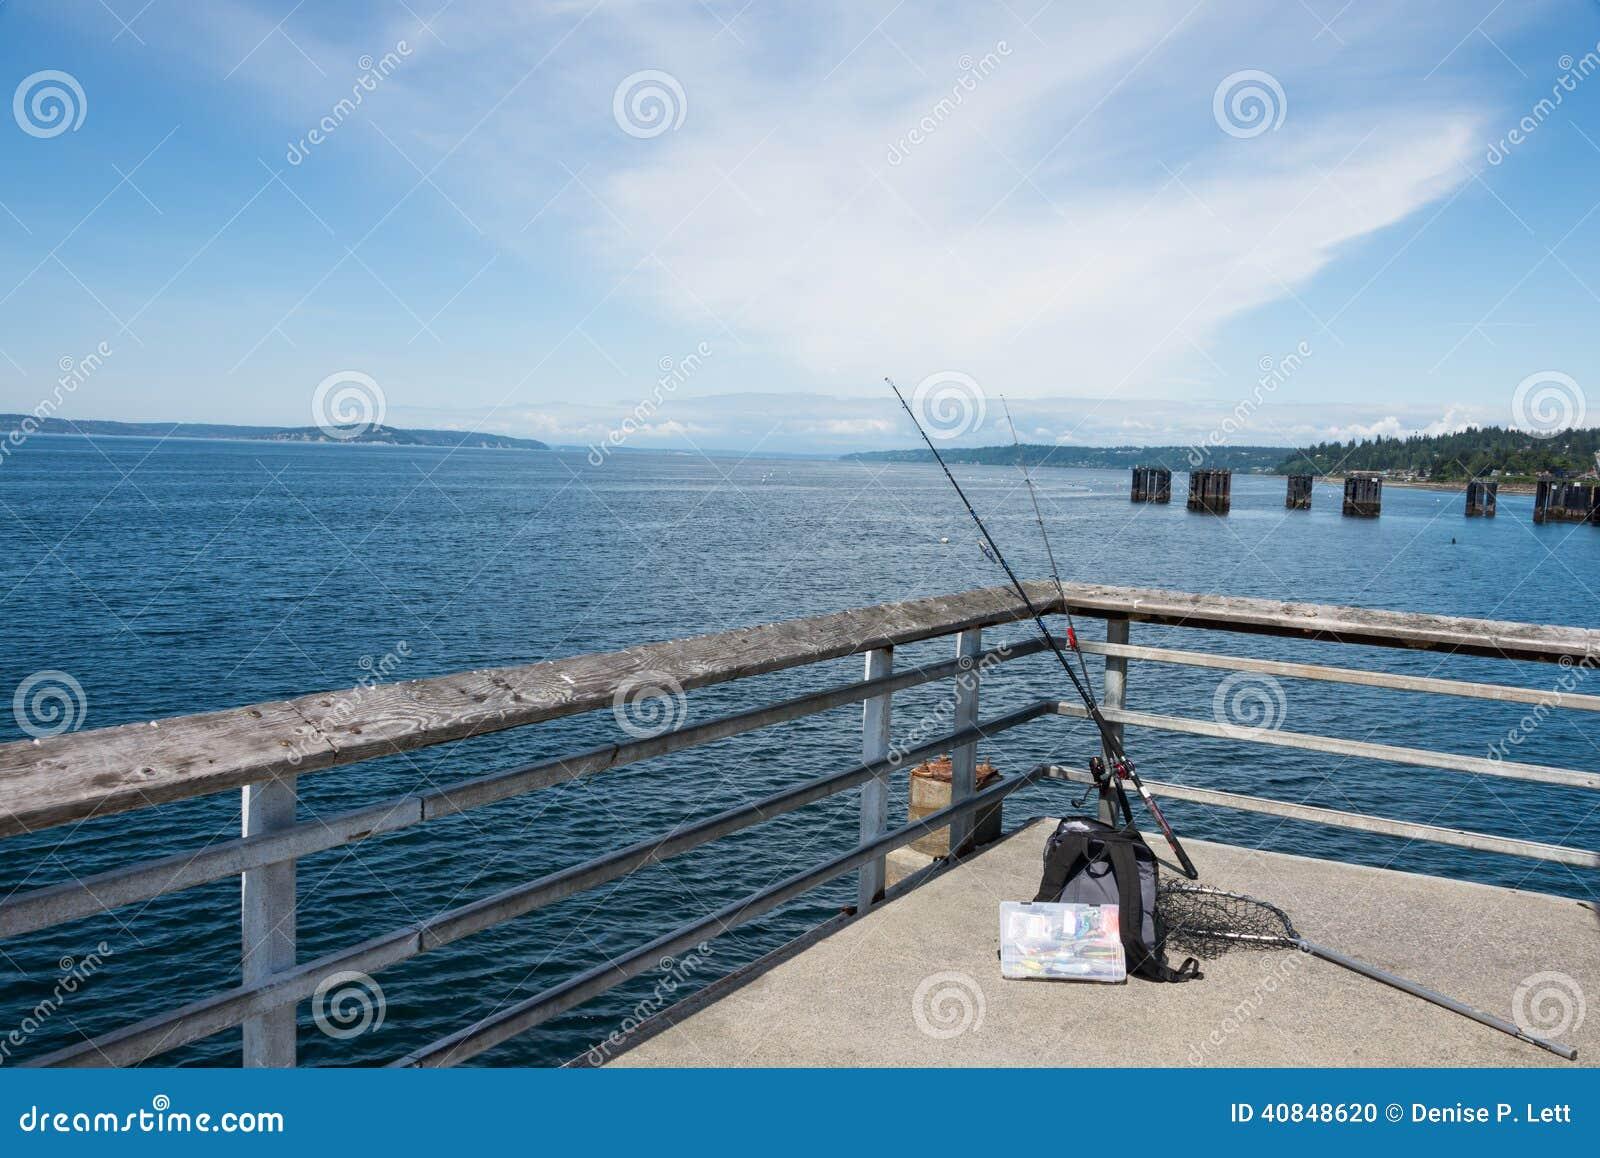 Fishing gear on pier stock photo image 40848620 for Pier fishing net